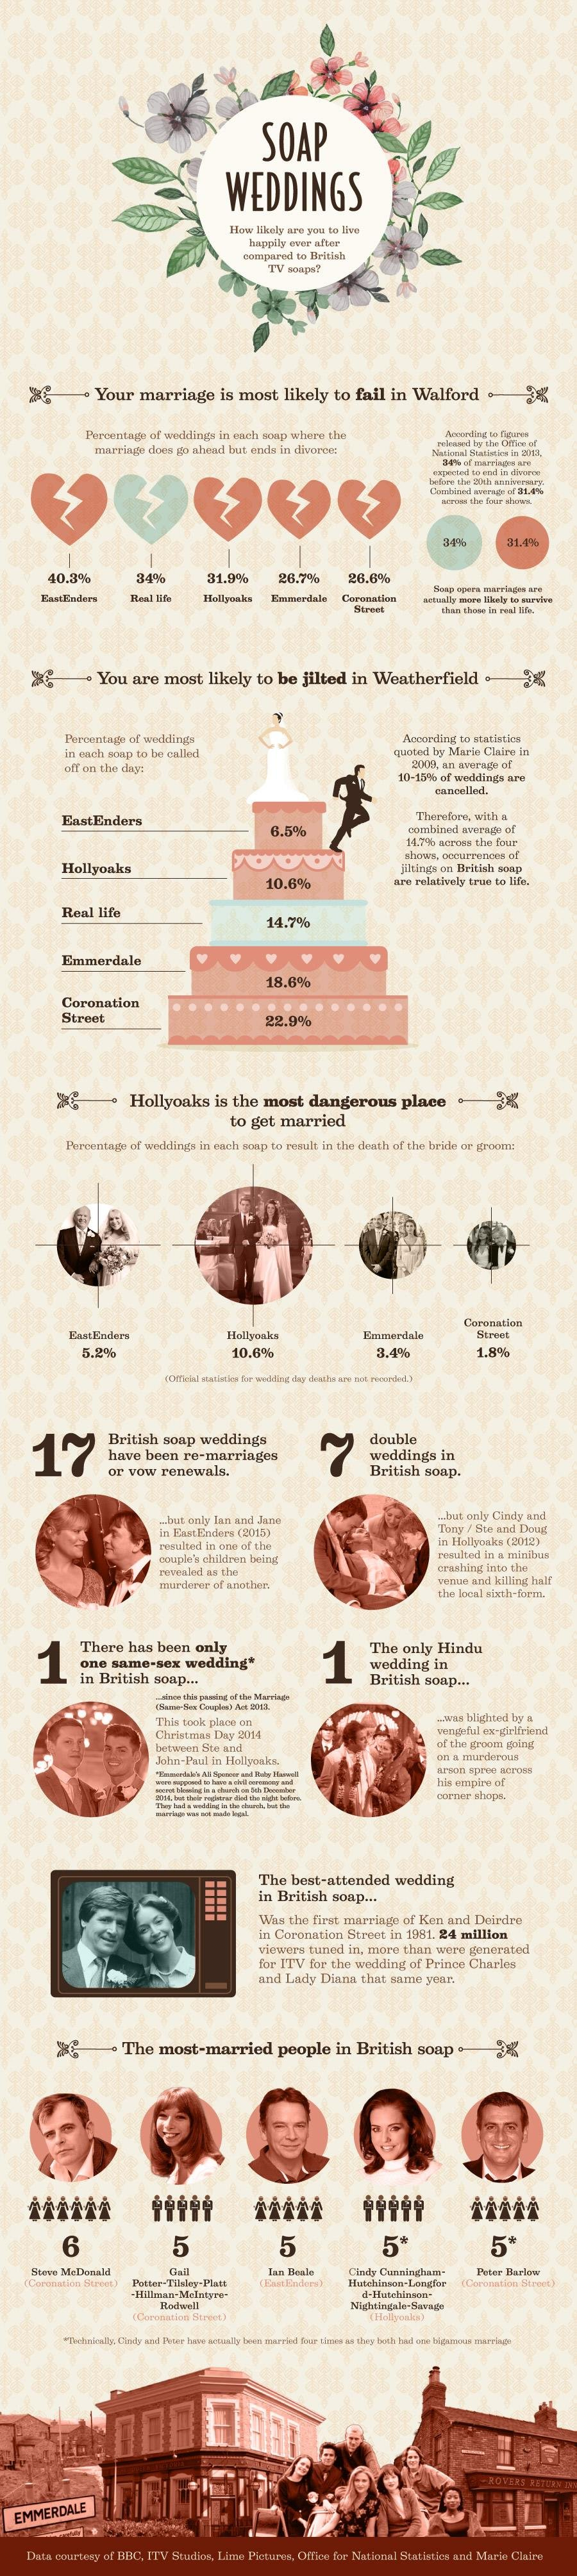 Infographic: Soap Weddings